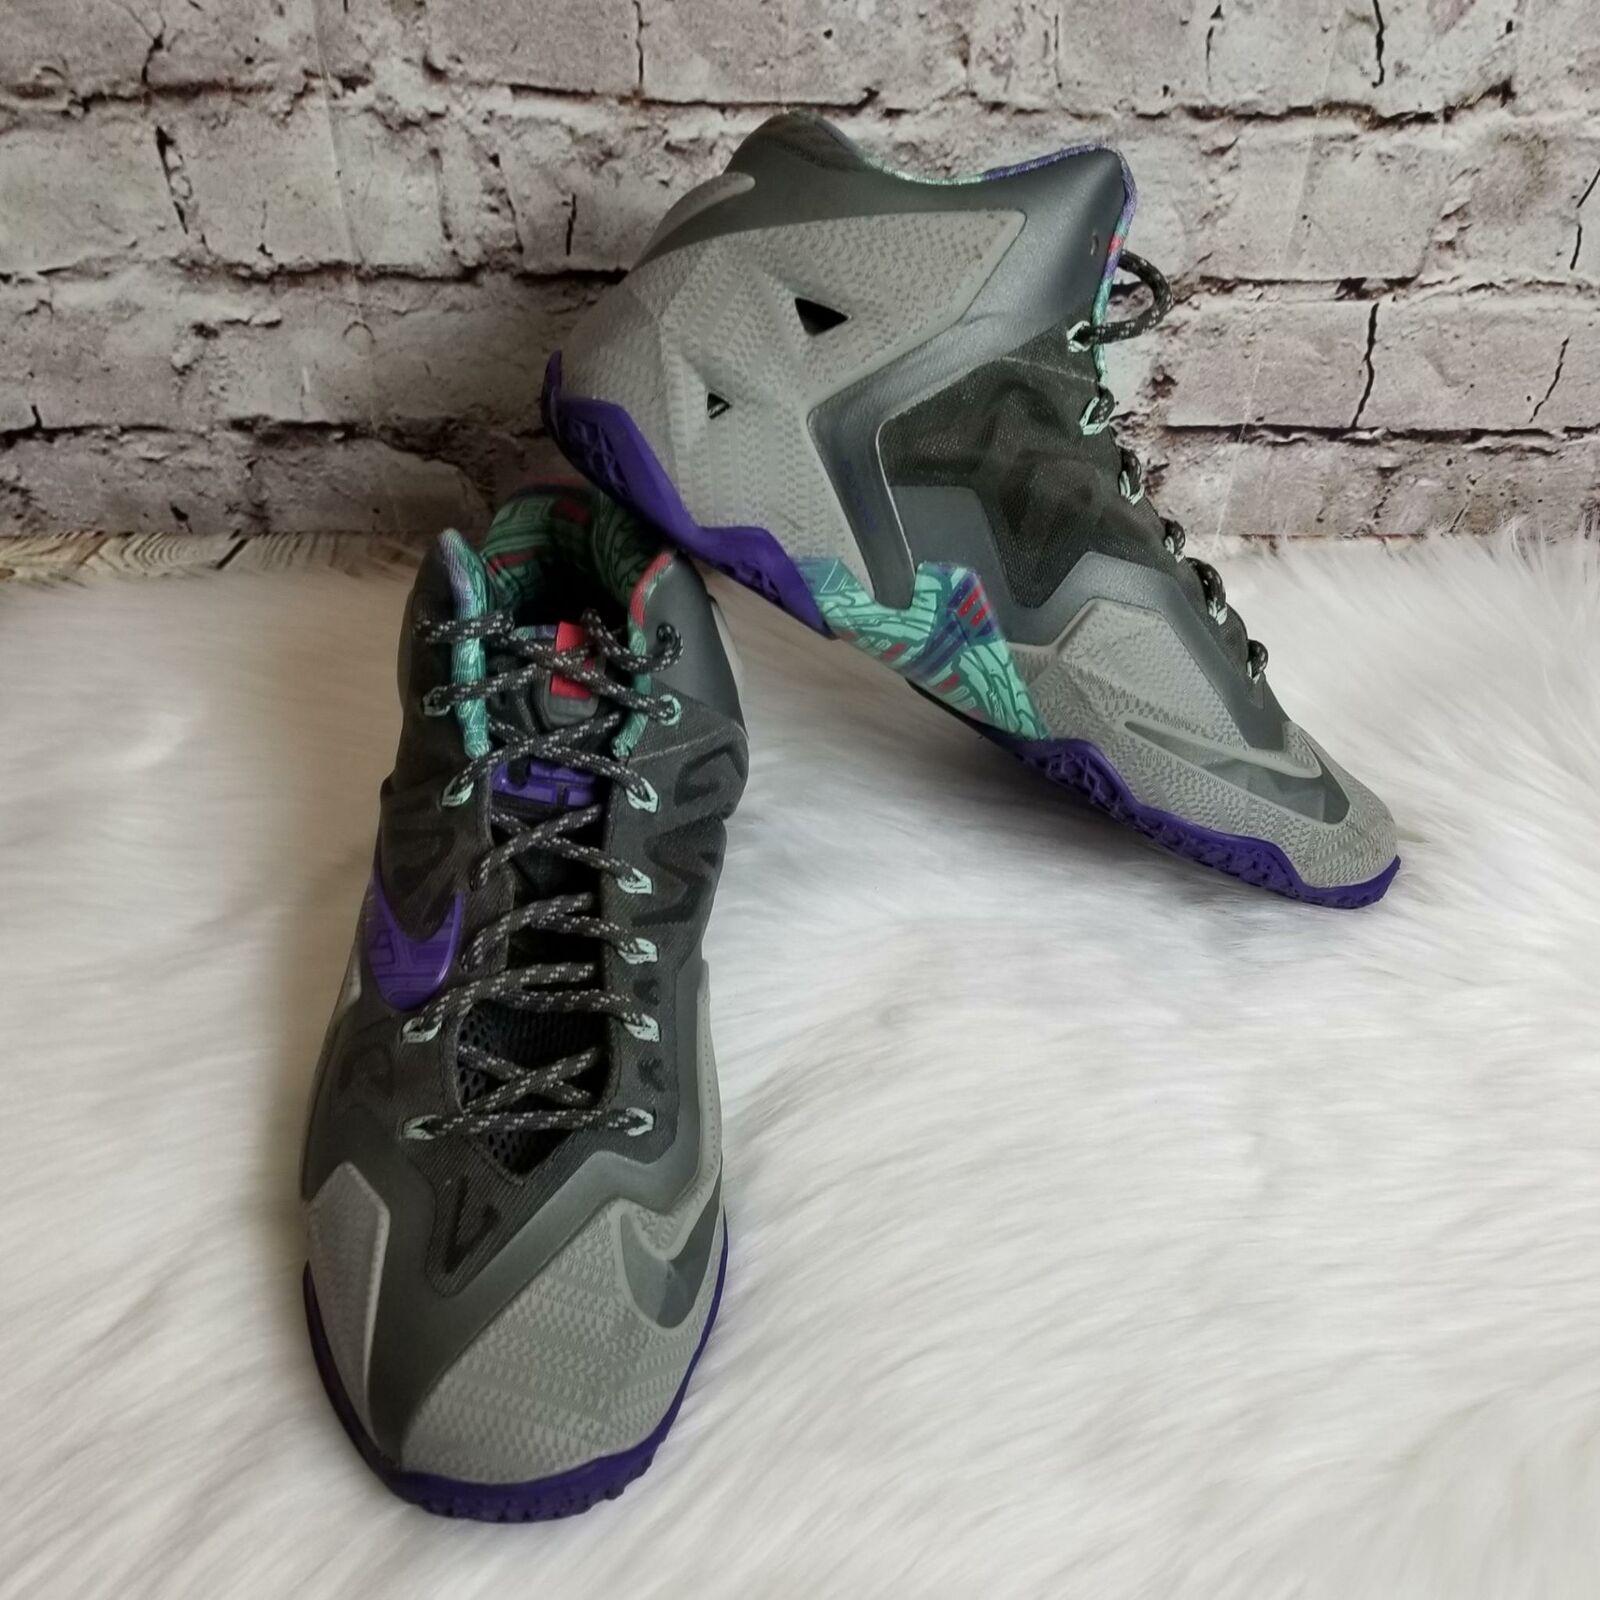 7a2f0c1f4abb Nike Men s Lebron XI 11 Warrior Basketball Sneakers Size Size Size 10M Mine  Grey Purple 1a58ac